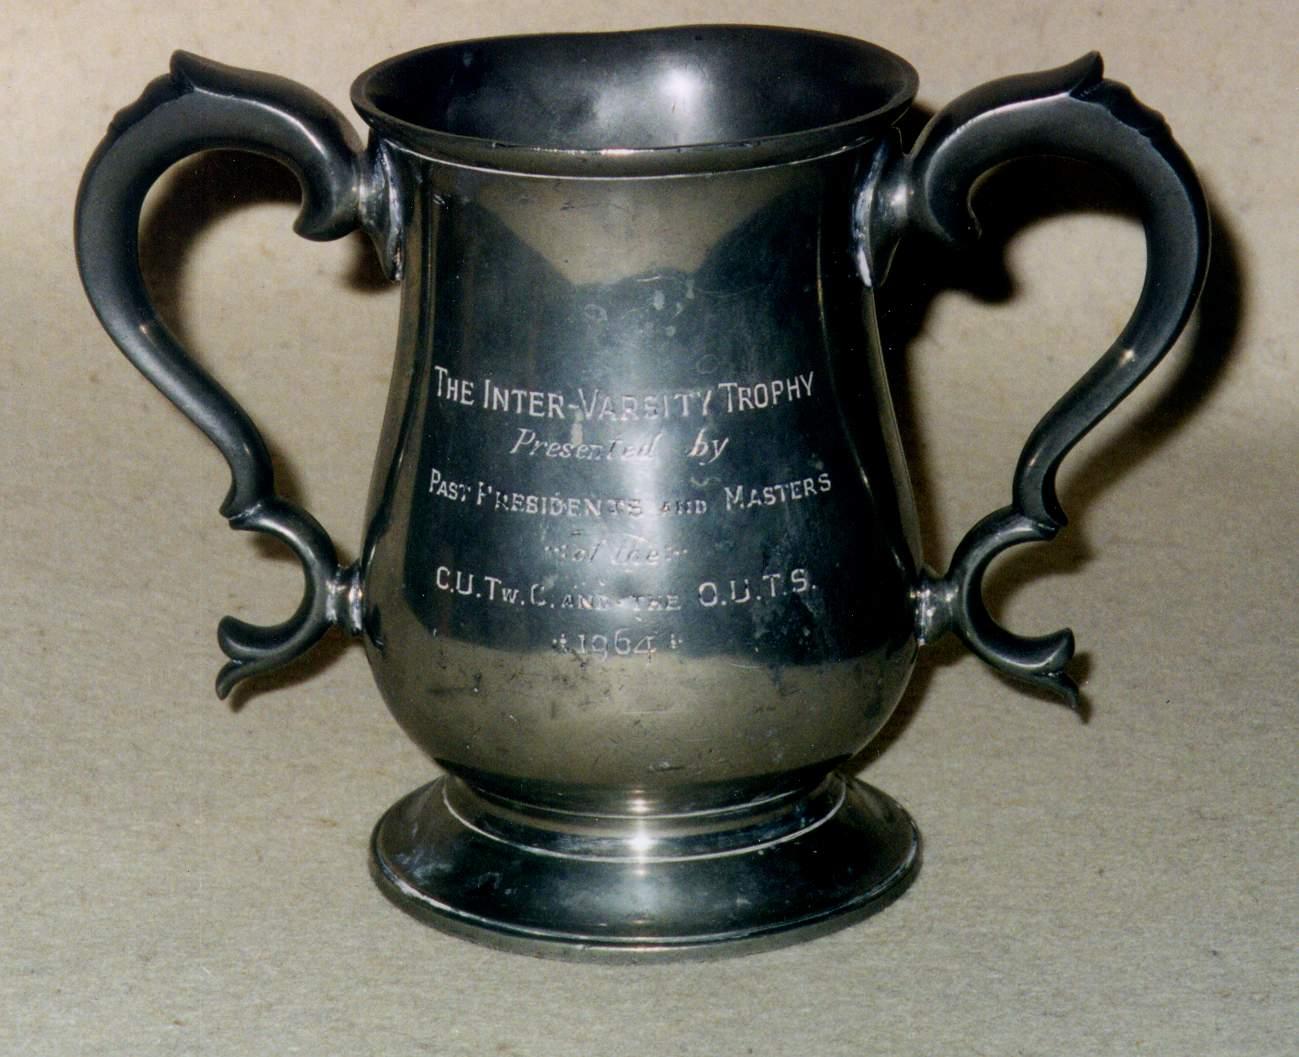 The Varsity Trophy